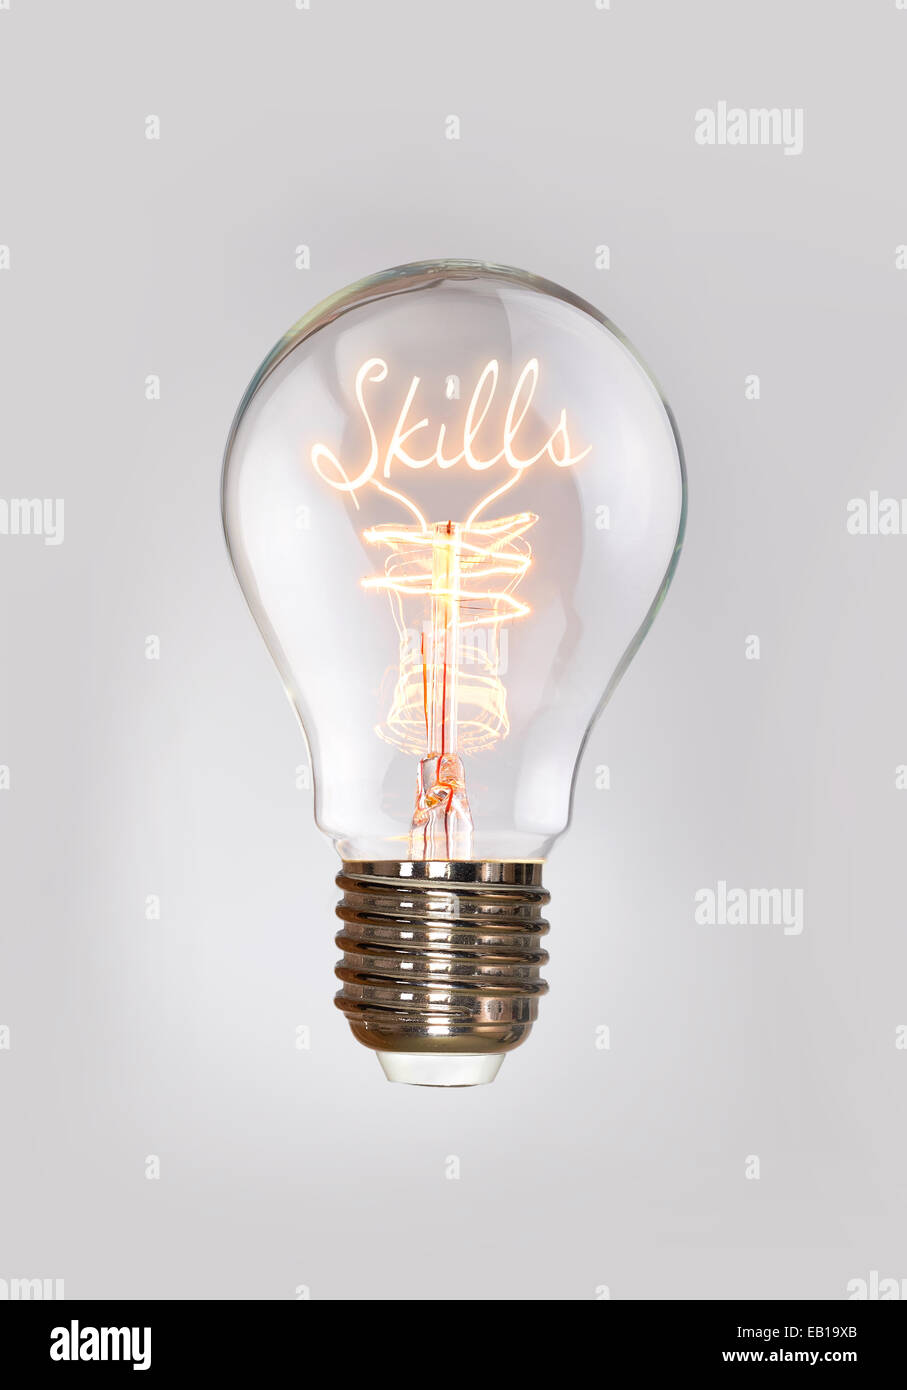 Skills concept in a filament lightbulb. - Stock Image